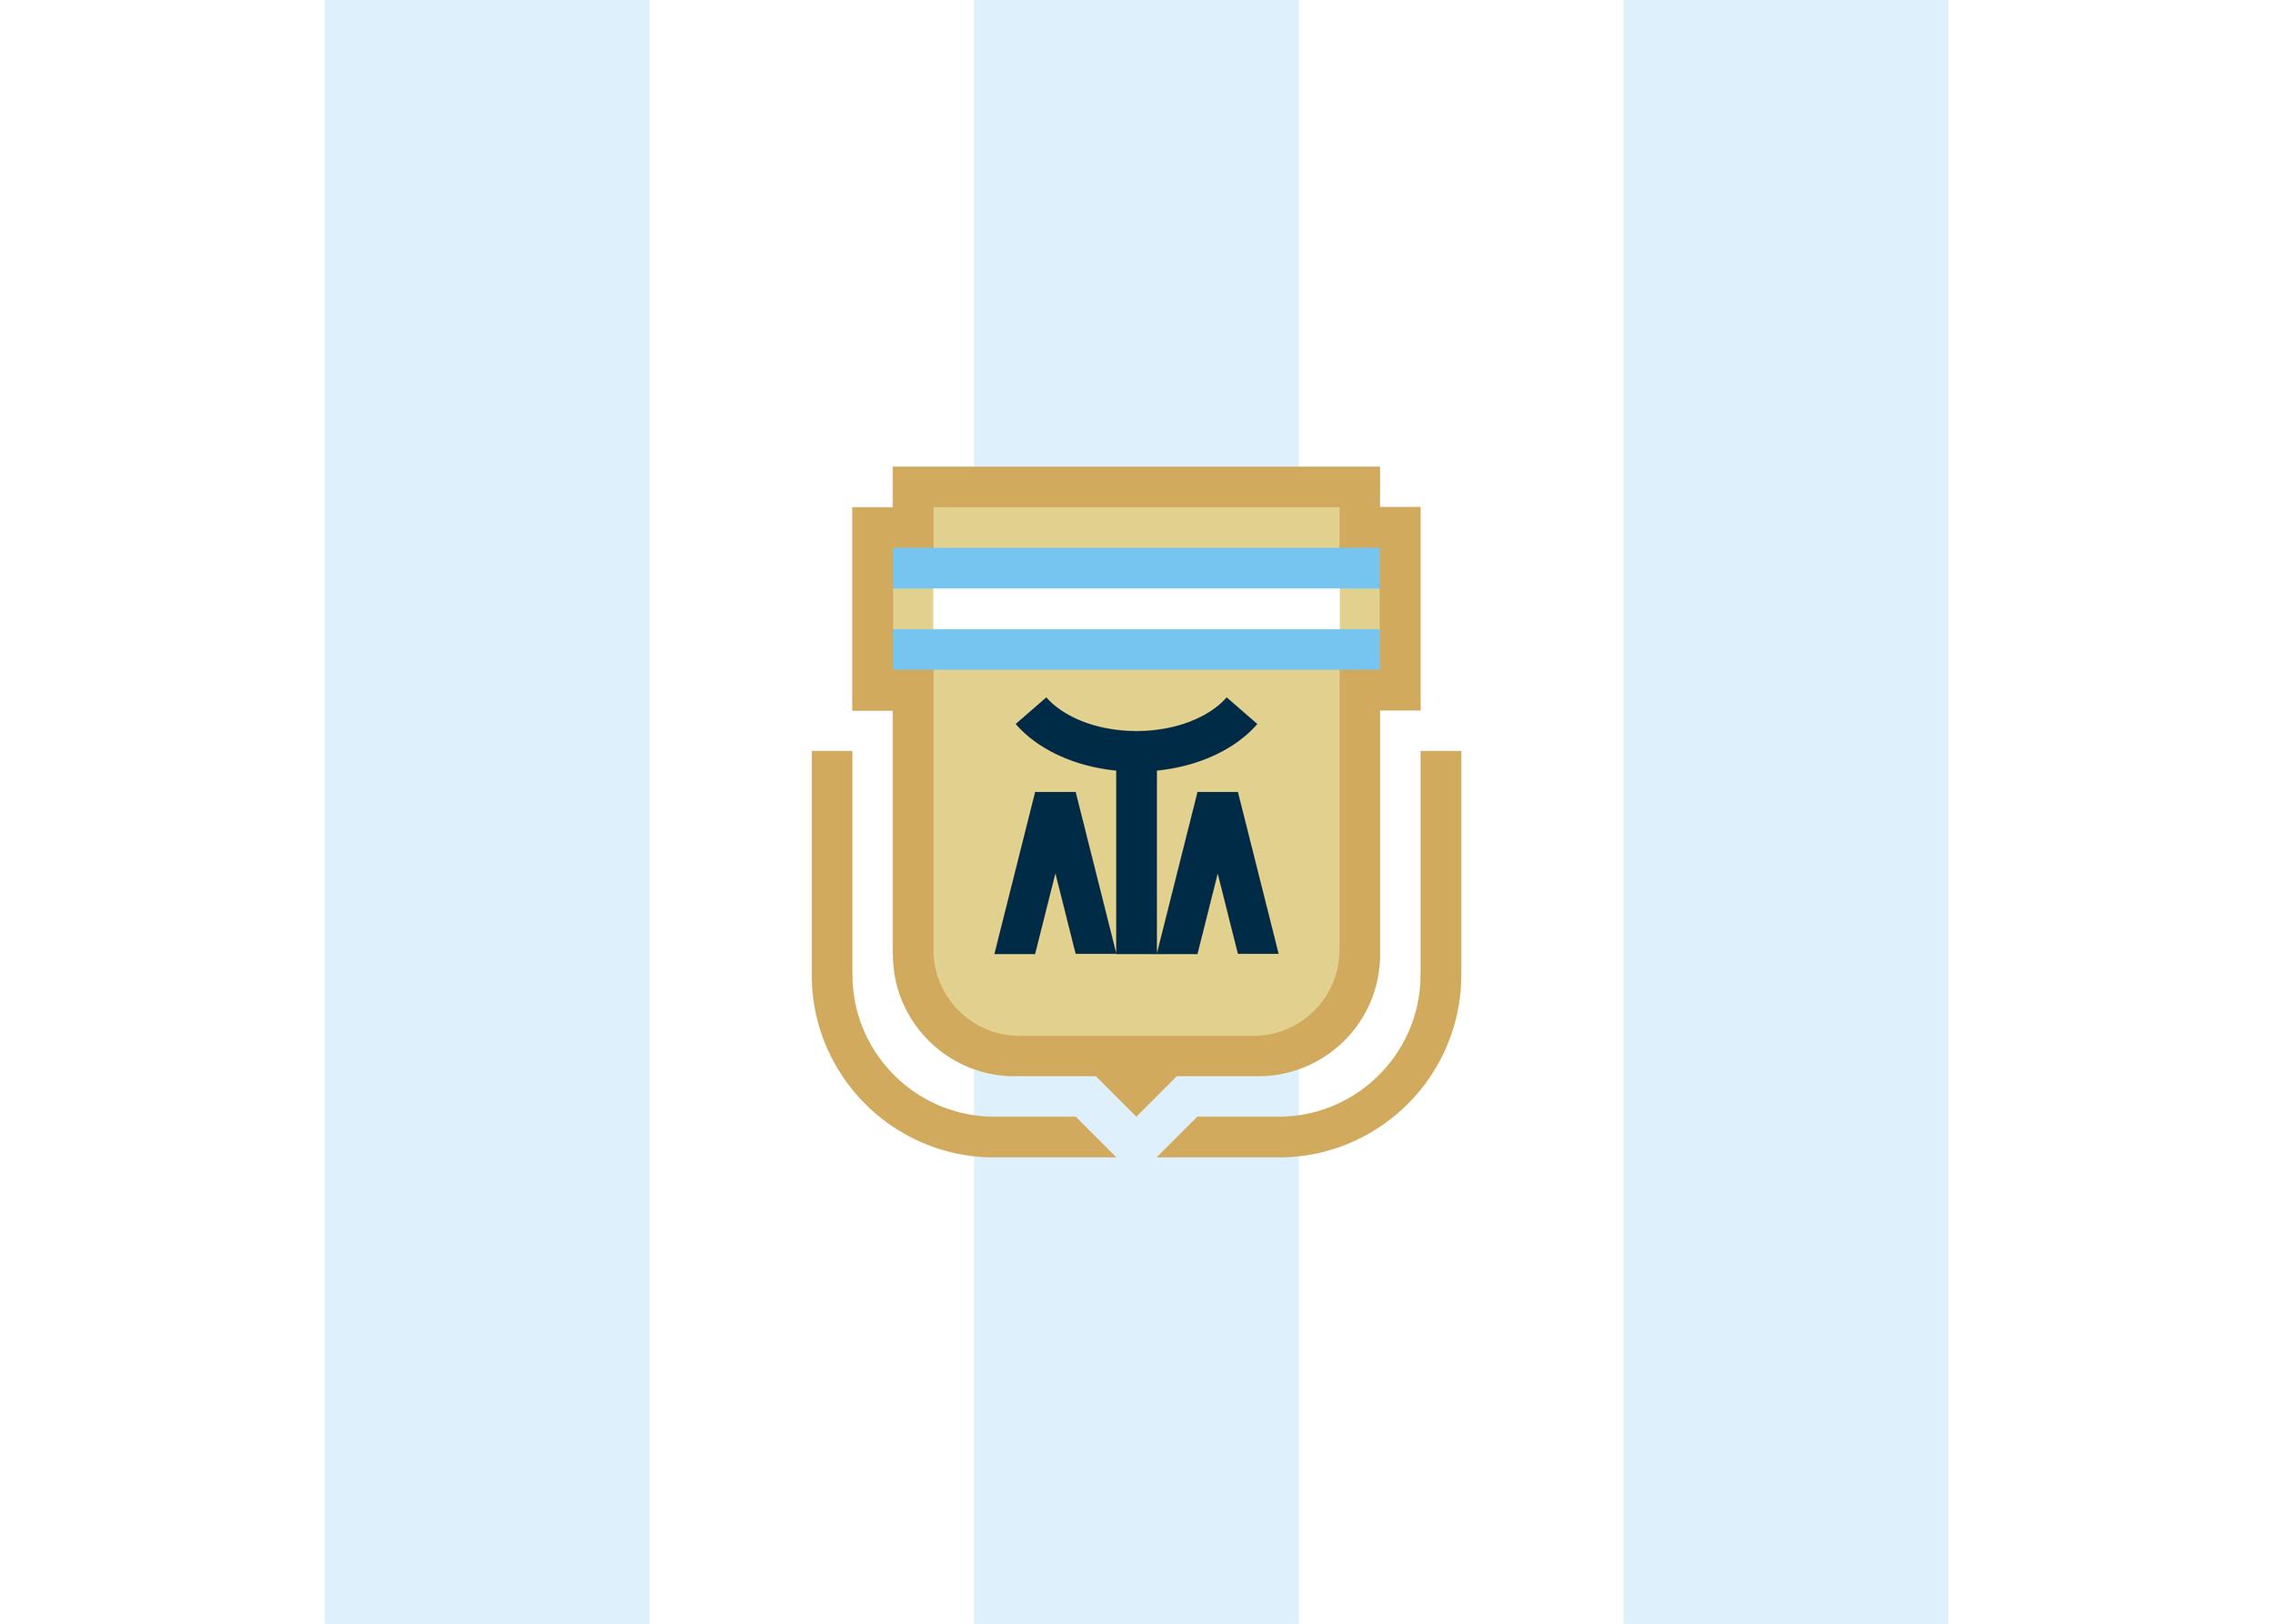 Argentina-Geometric-World-Cup-Football-Badge-01-Logo-Design-Freelance-Kent.png